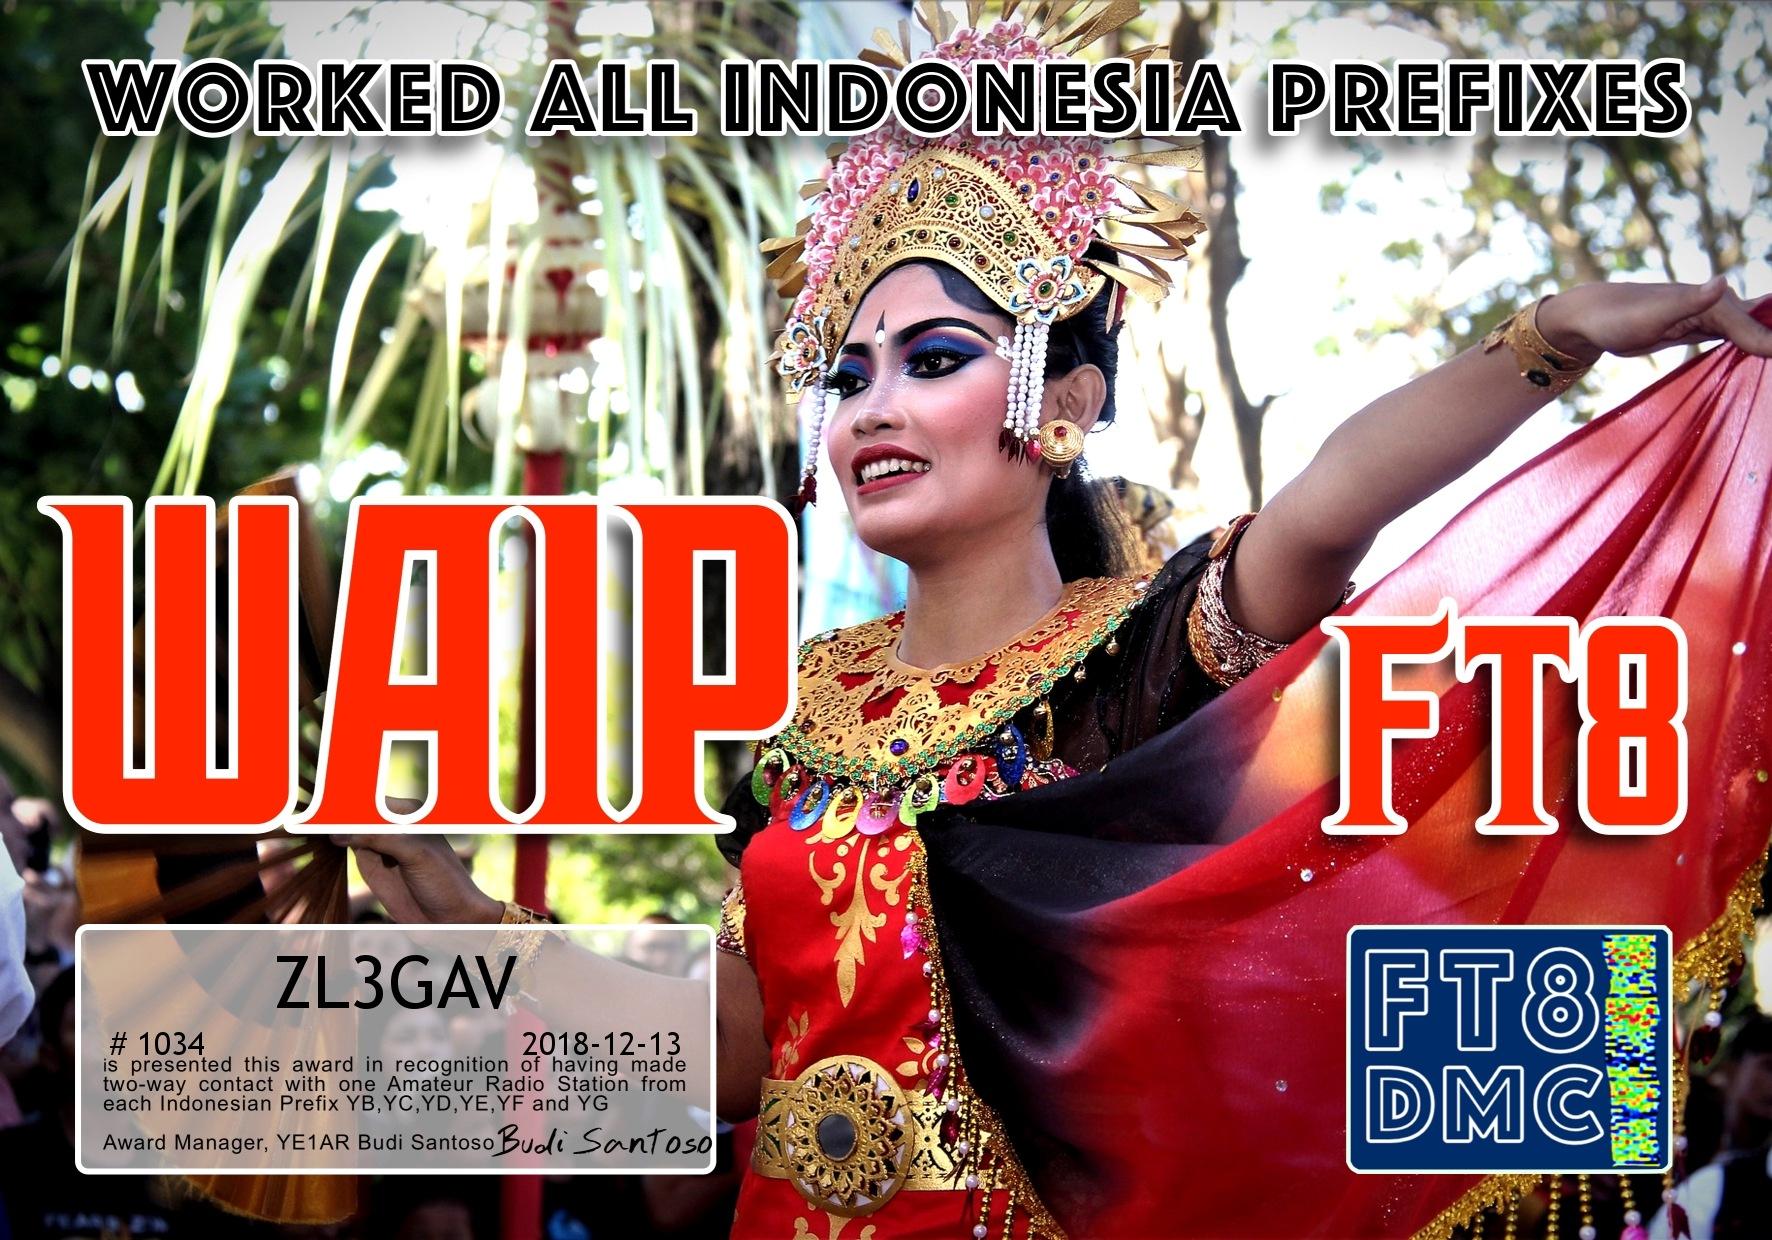 ZL3GAV-WAIP-WAIP.jpg